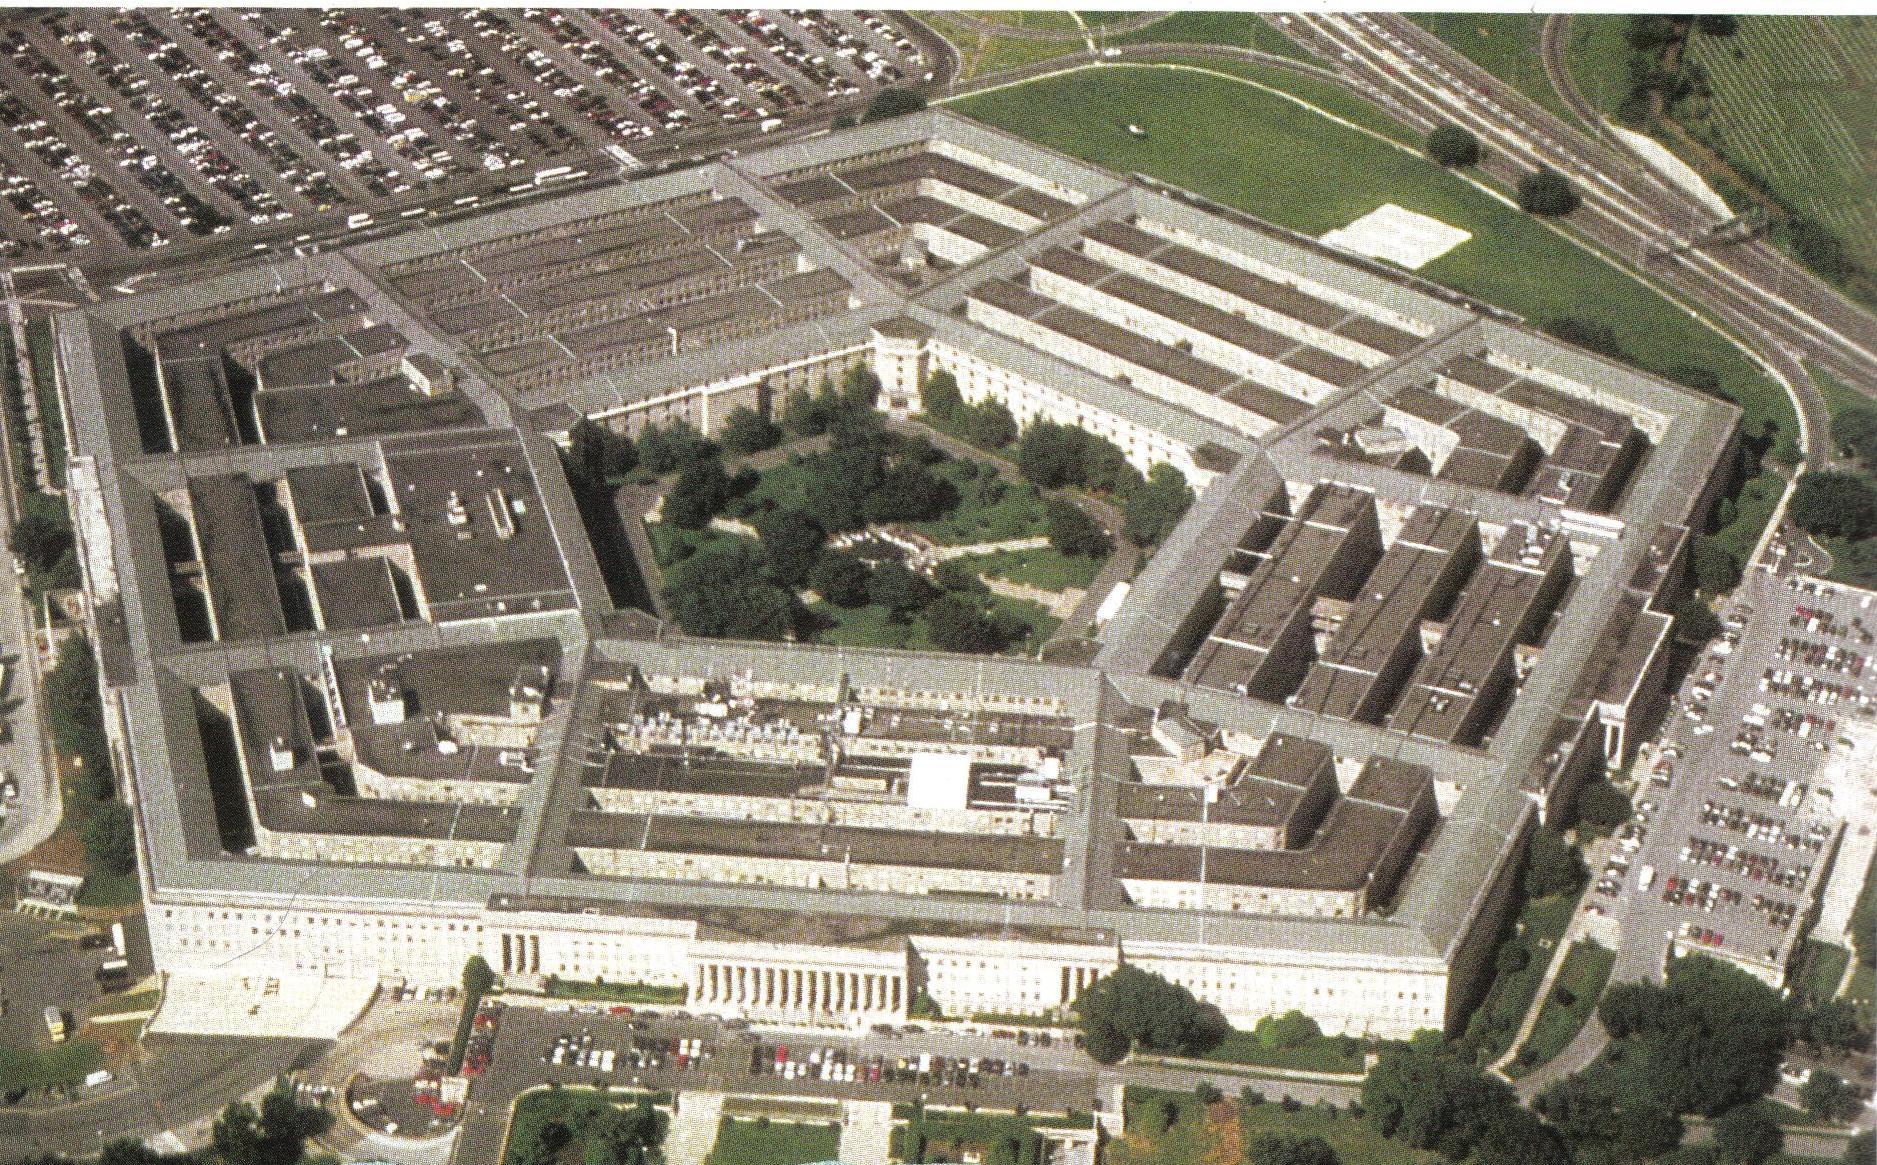 http://img3.wikia.nocookie.net/__cb20100427093735/metalgear/images/1/1d/The_Pentagon.jpg